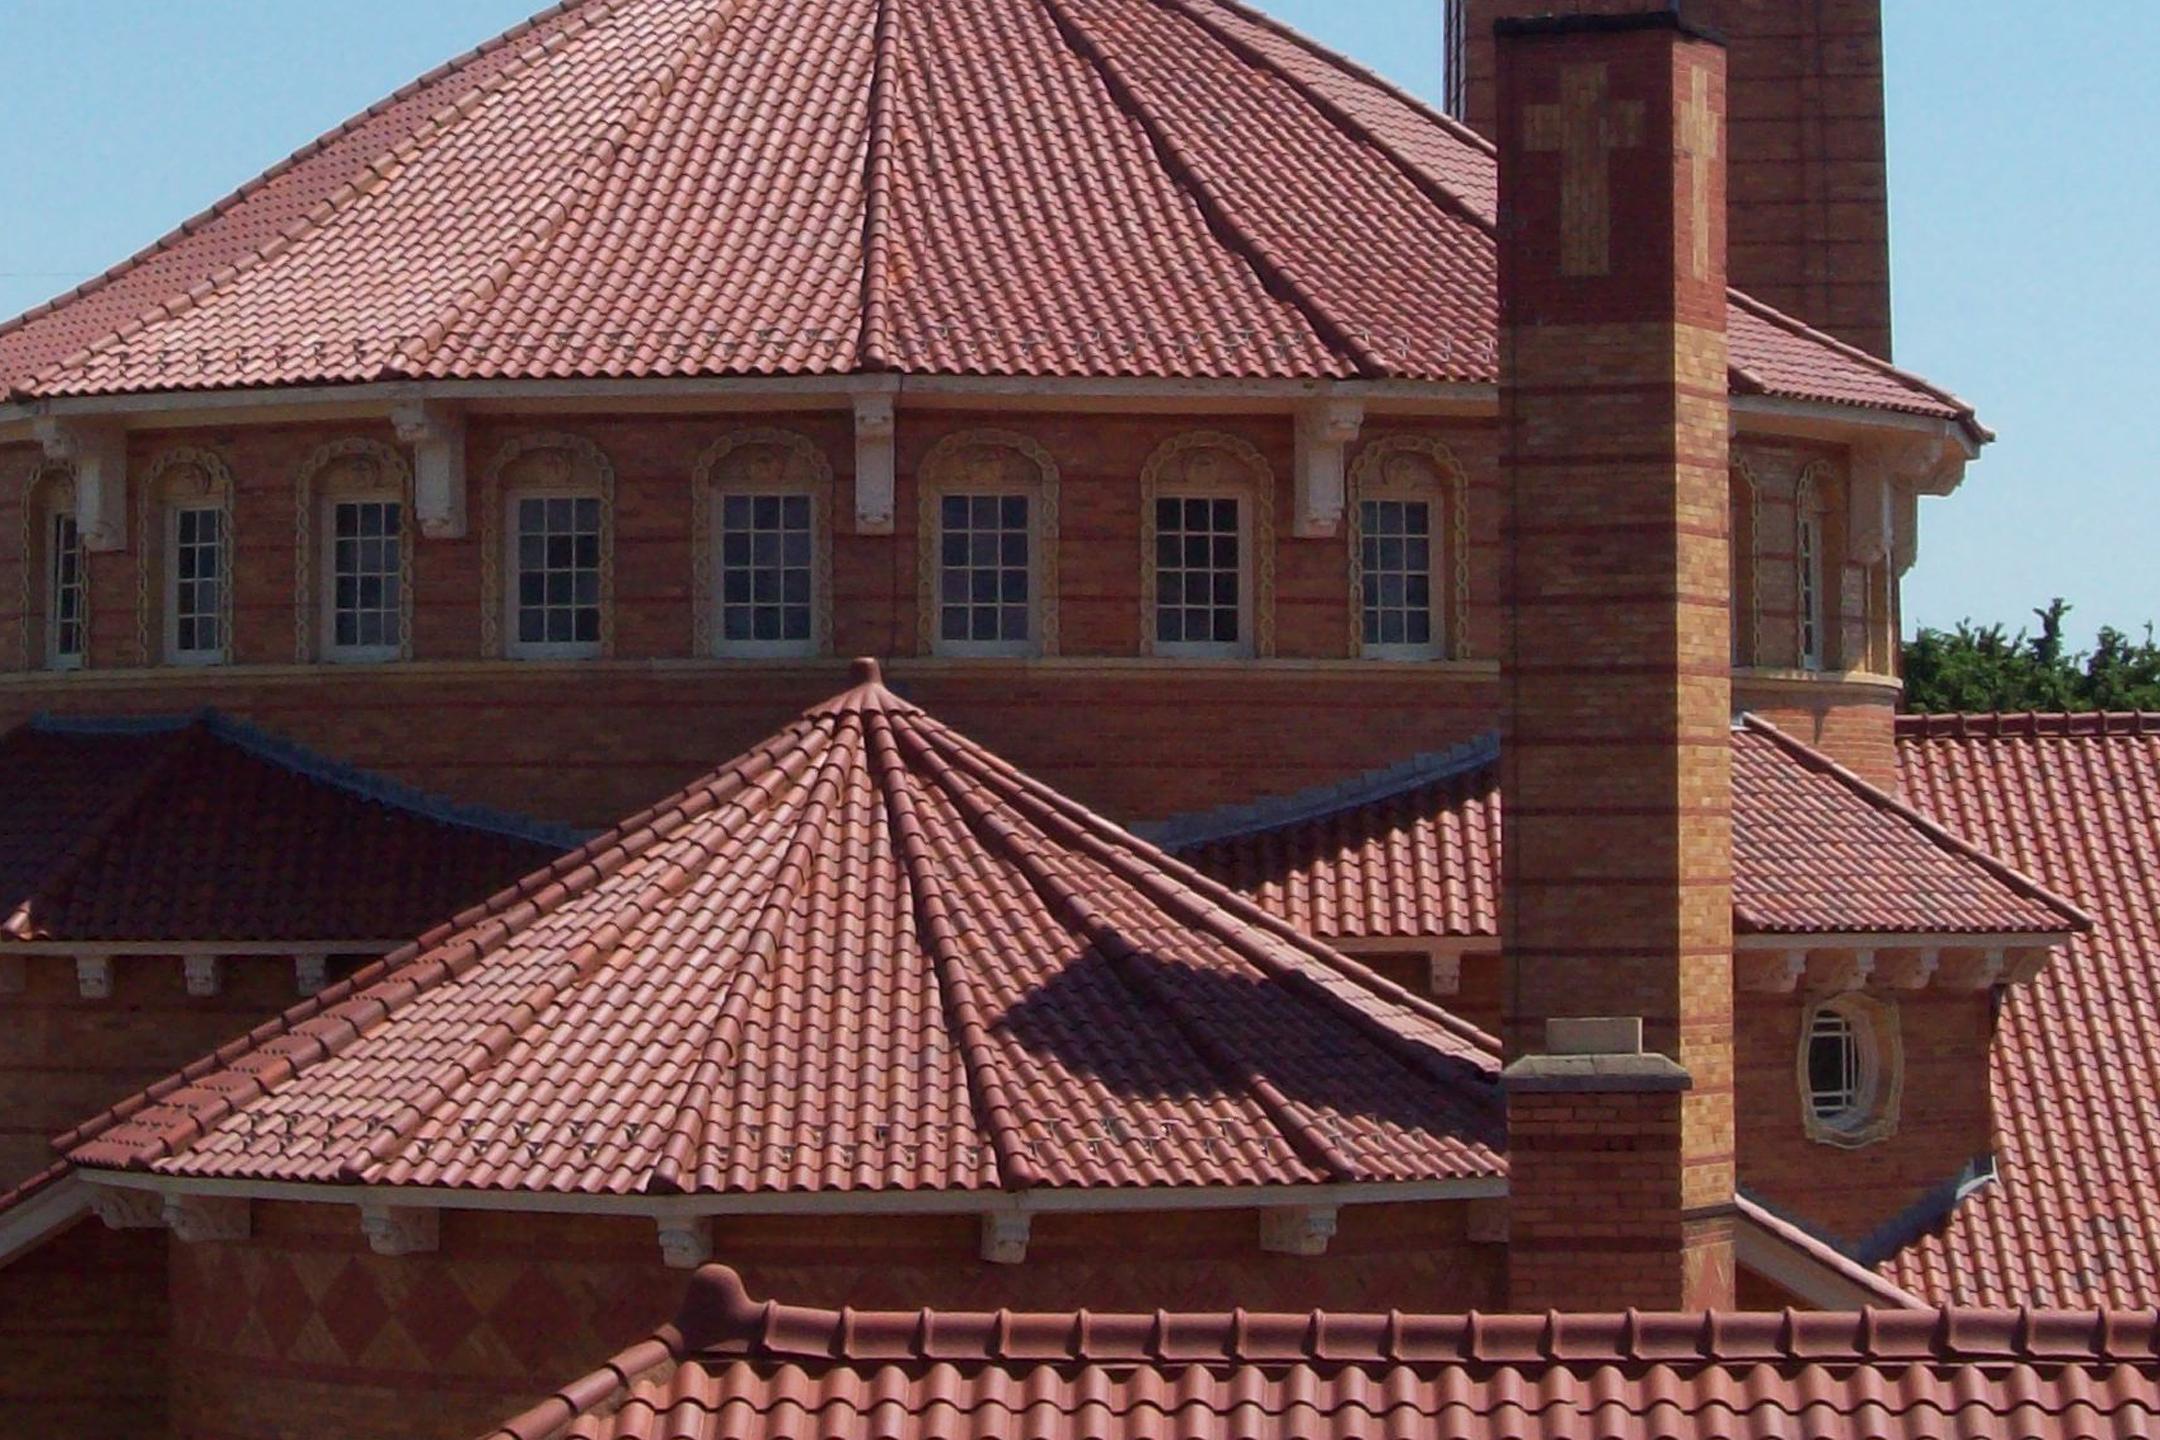 01-Spanish Tile Roofscape.JPG